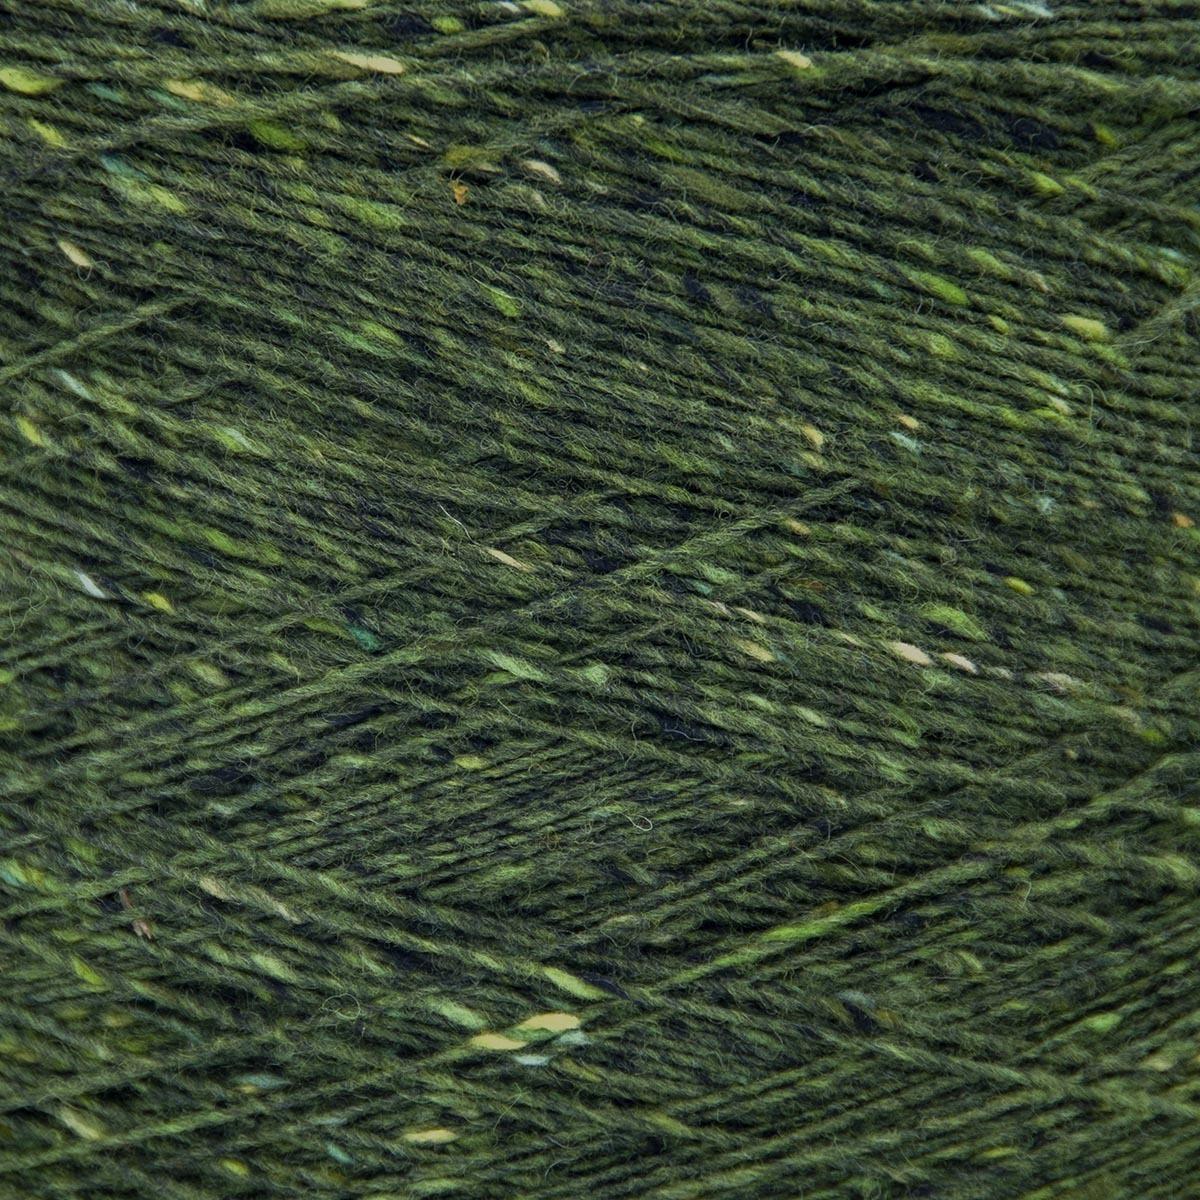 Knoll Yarns Soft Donegal (одинарный твид) - 5525